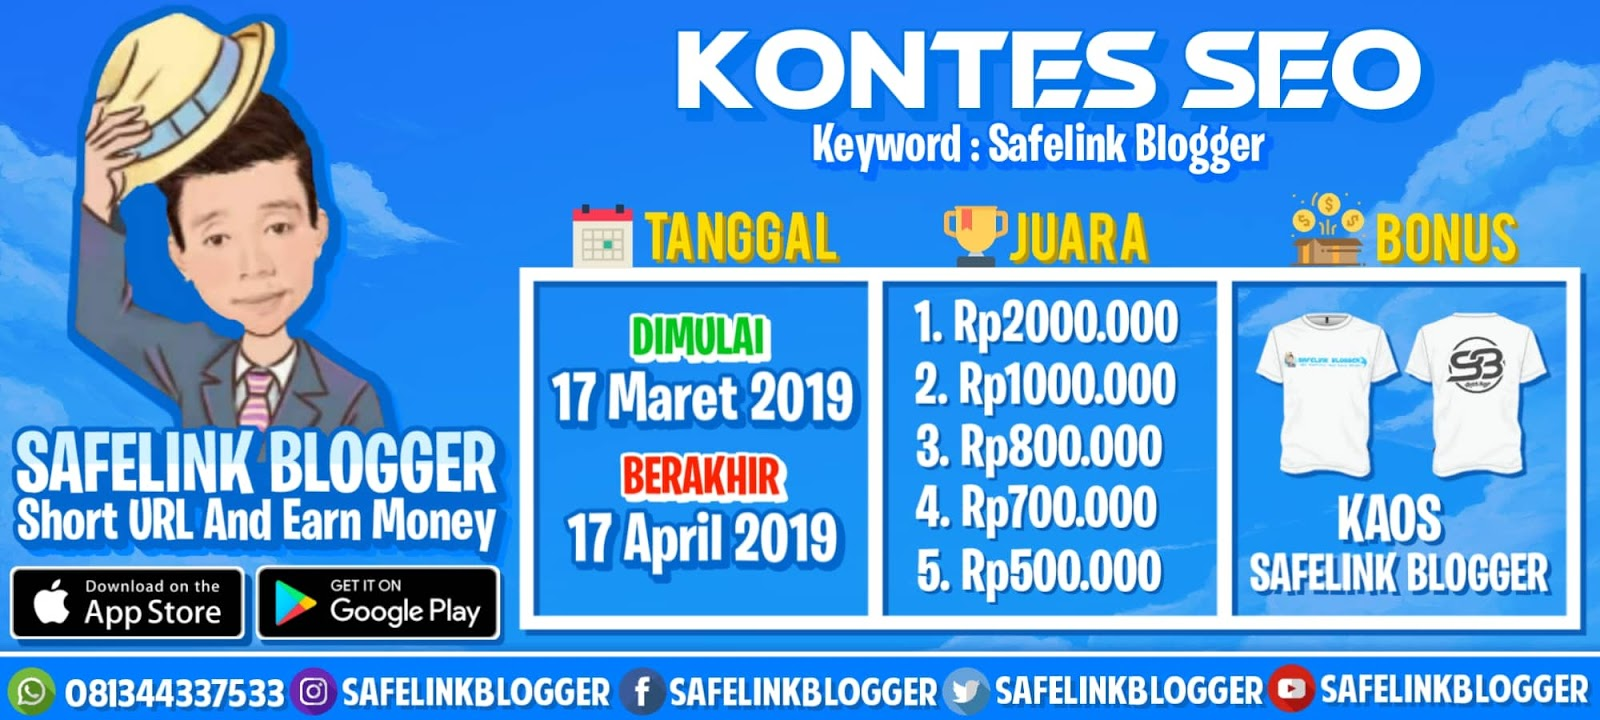 Safelink Blogger Short URL And Earn Money